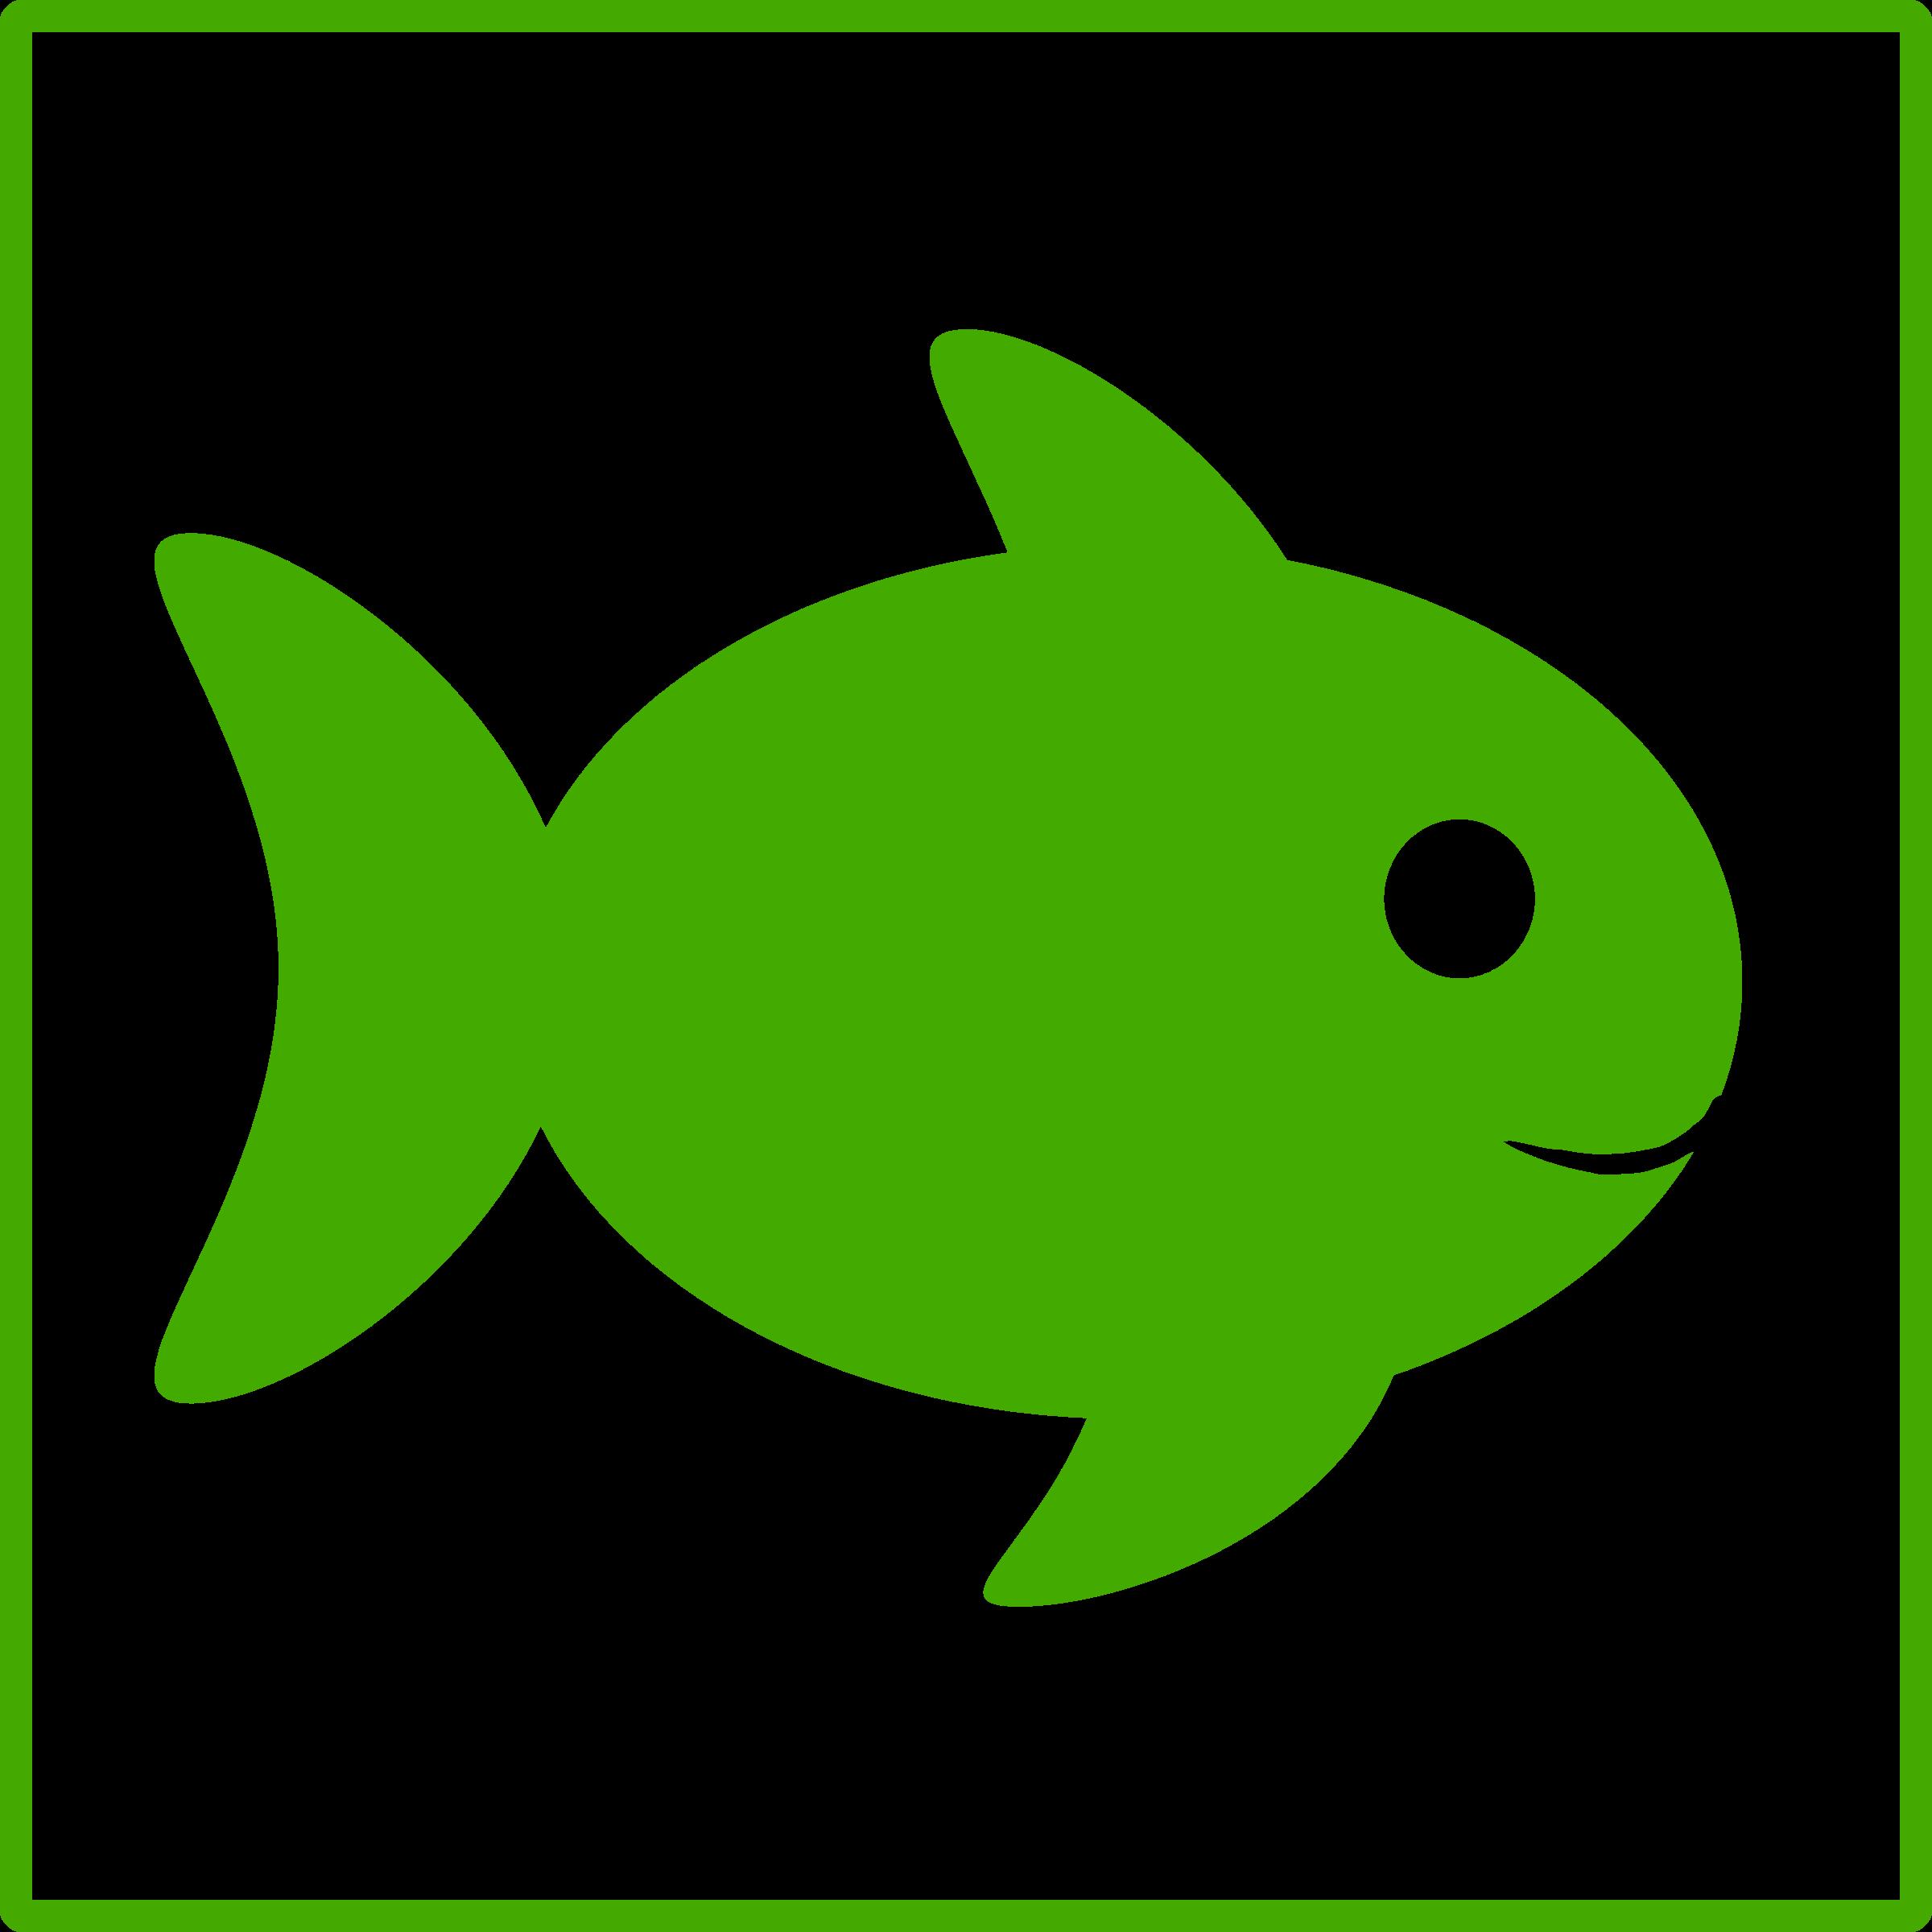 Fish clipart face. Eco green icon big